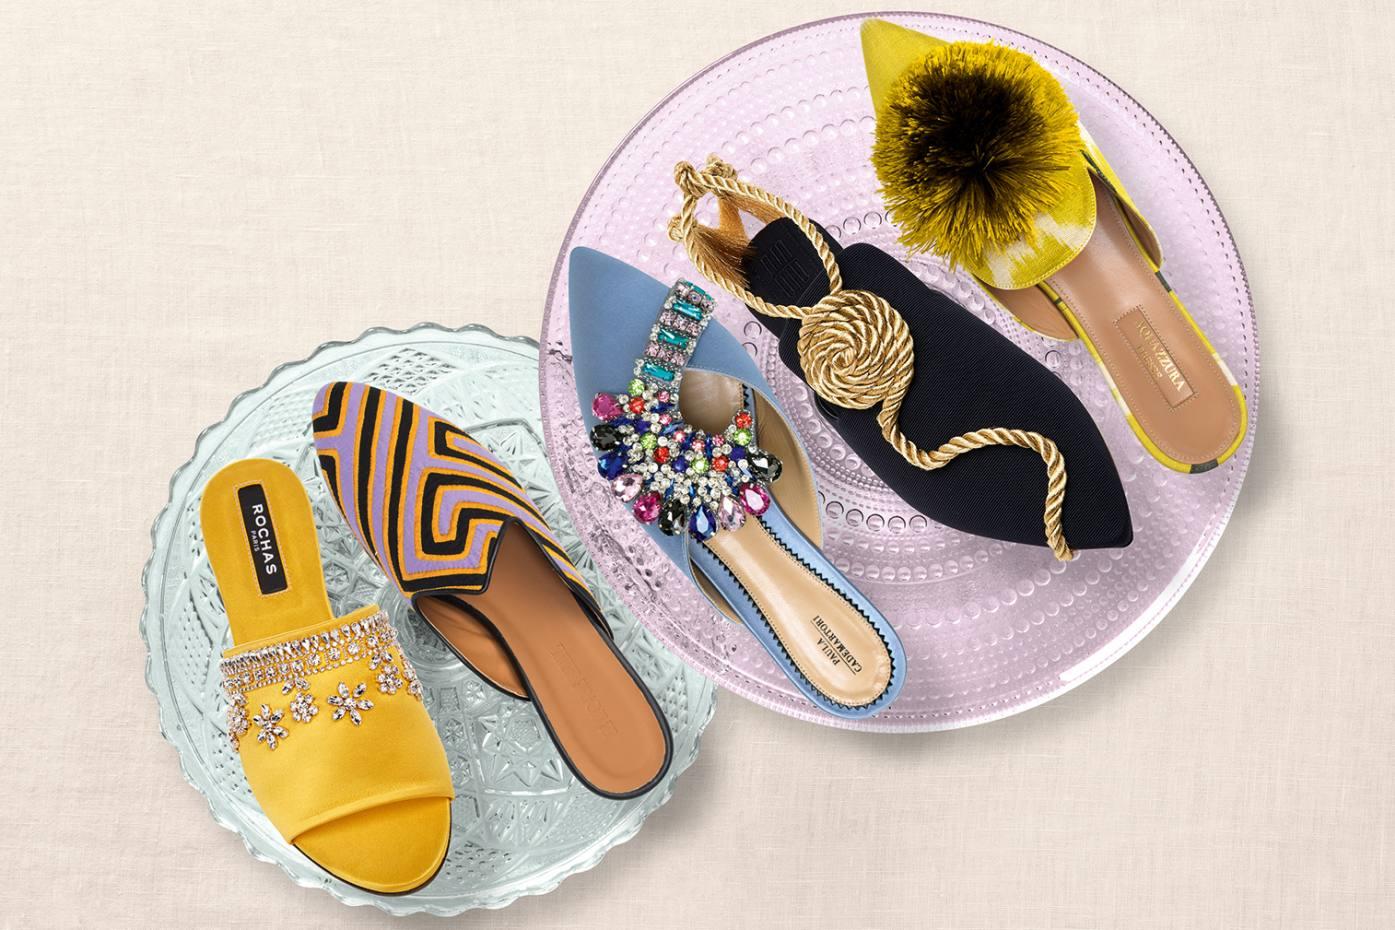 From left: Rochas crystal-embellished satin sandals, £540. Le Monde Beryl x Mola Sasa cotton mules, £305. Paula Cademartori crystal-embellished satin mules, £580. Sanayi 313 faille and metallic cord Tramontana slippers, £695. Aquazzura ikat-fabric Powder Puff flats, £440